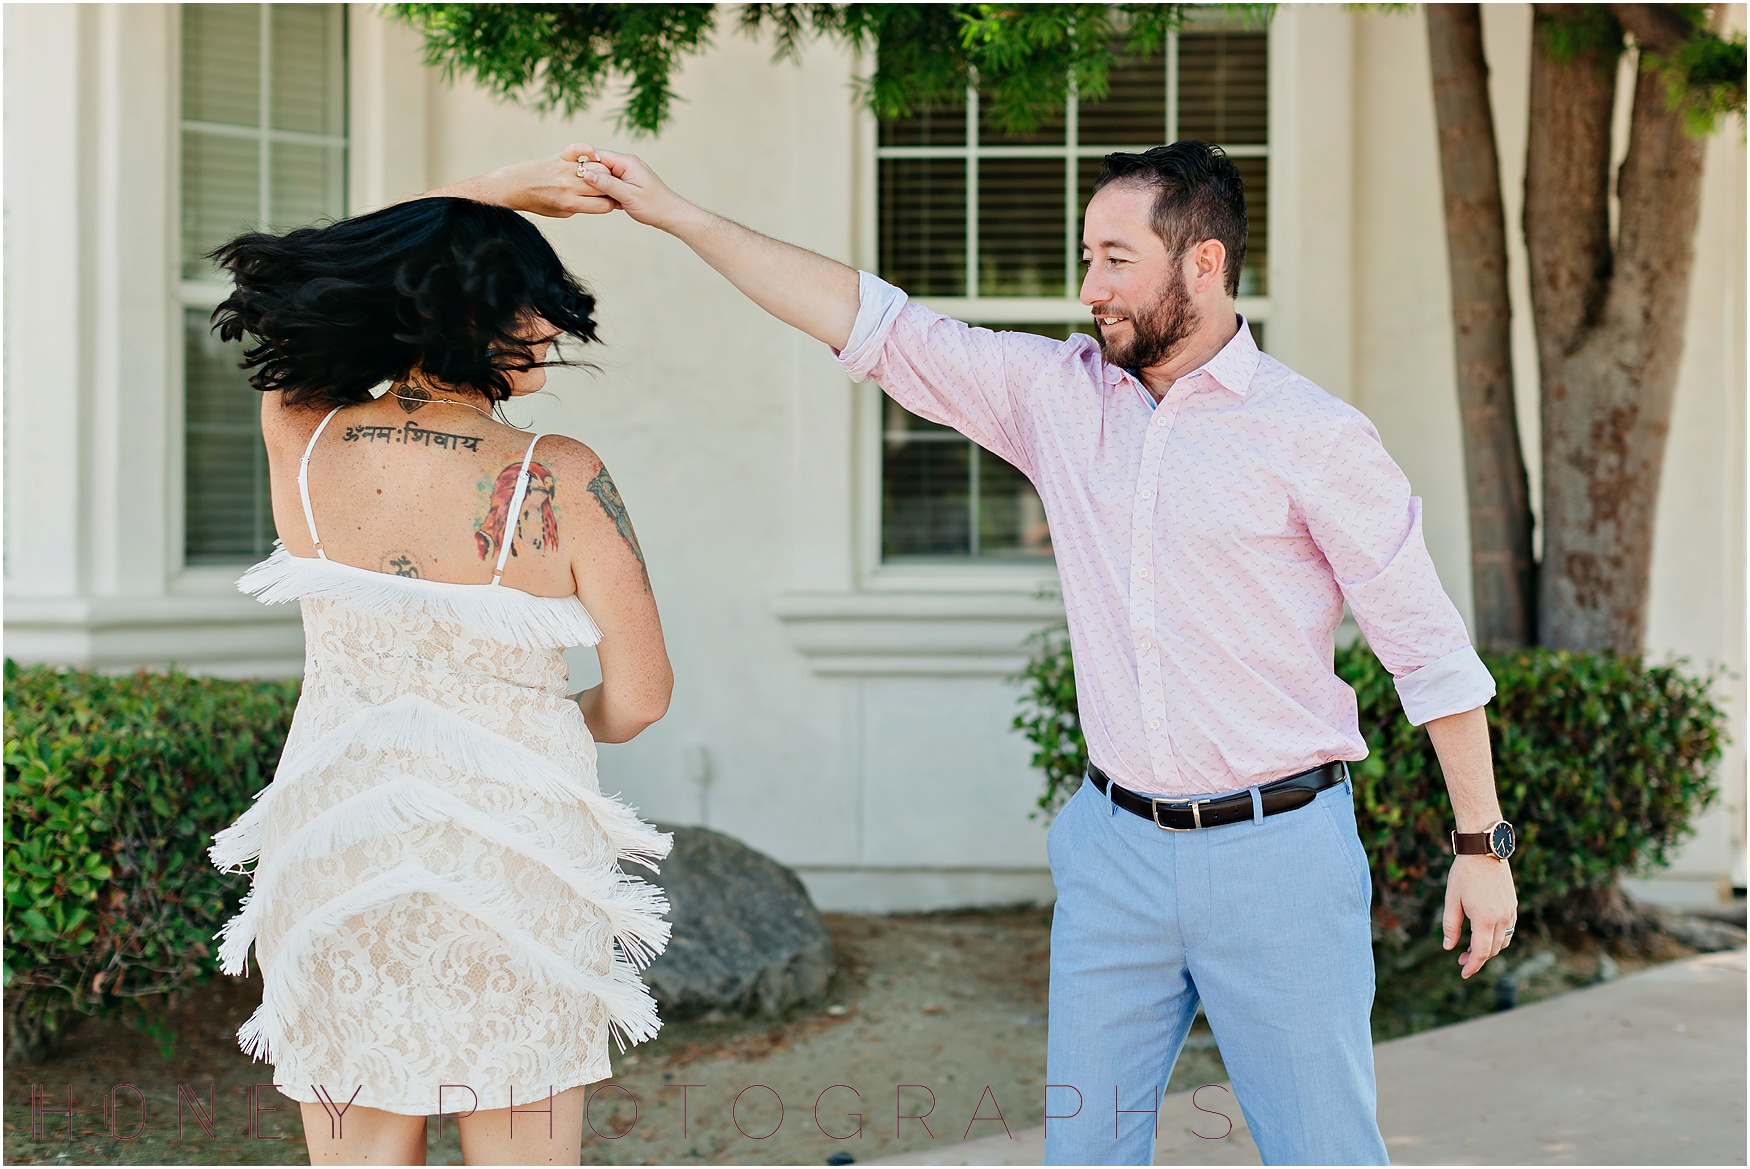 colorful_ecclectic_vibrant_vista_rainbow_quirky_wedding060.jpg